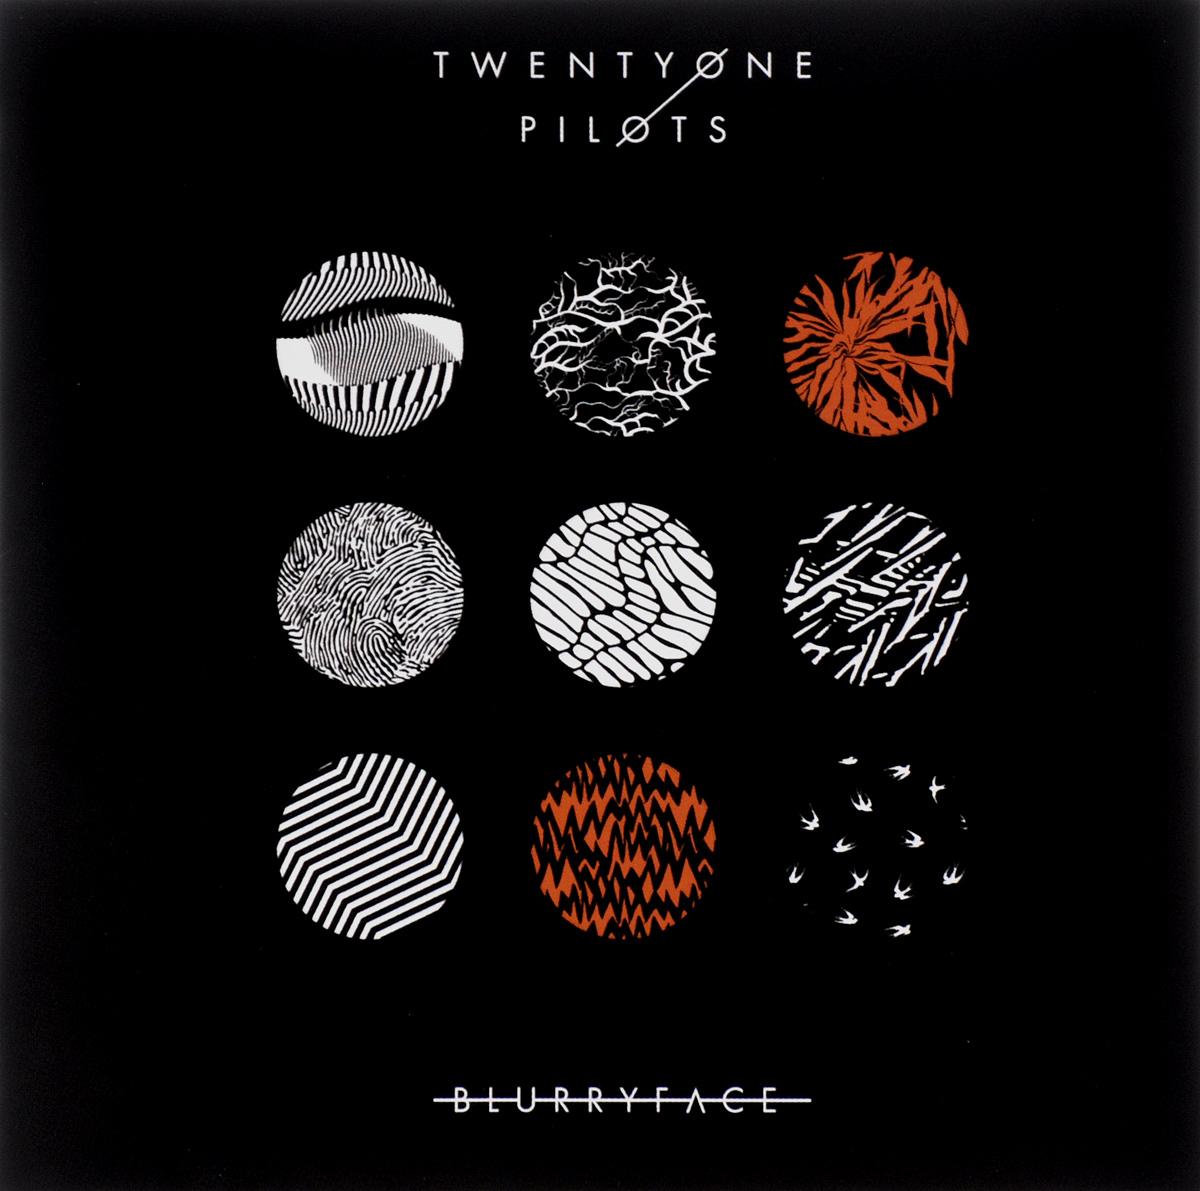 Twenty One Pilots Twenty One Pilots: Blurryface twenty one pilots twenty one pilots blurryface 2 lp